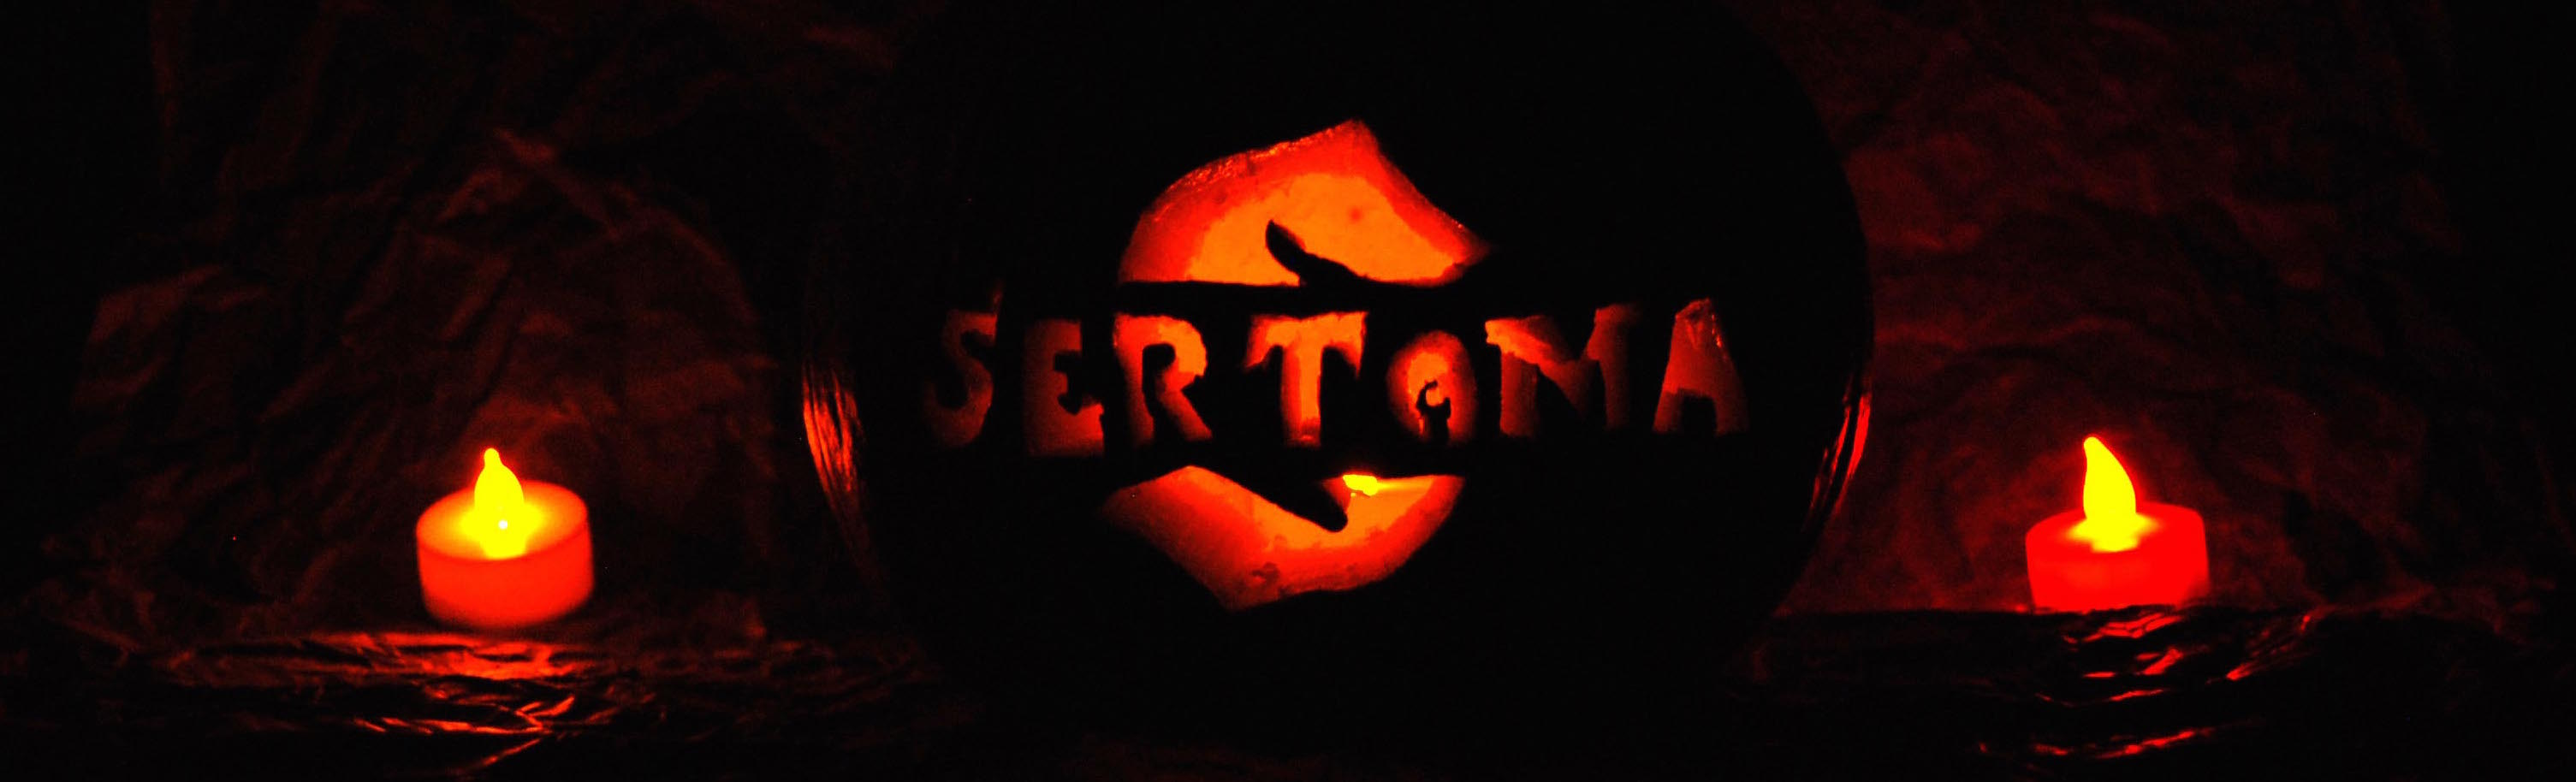 sertoma-black.jpg